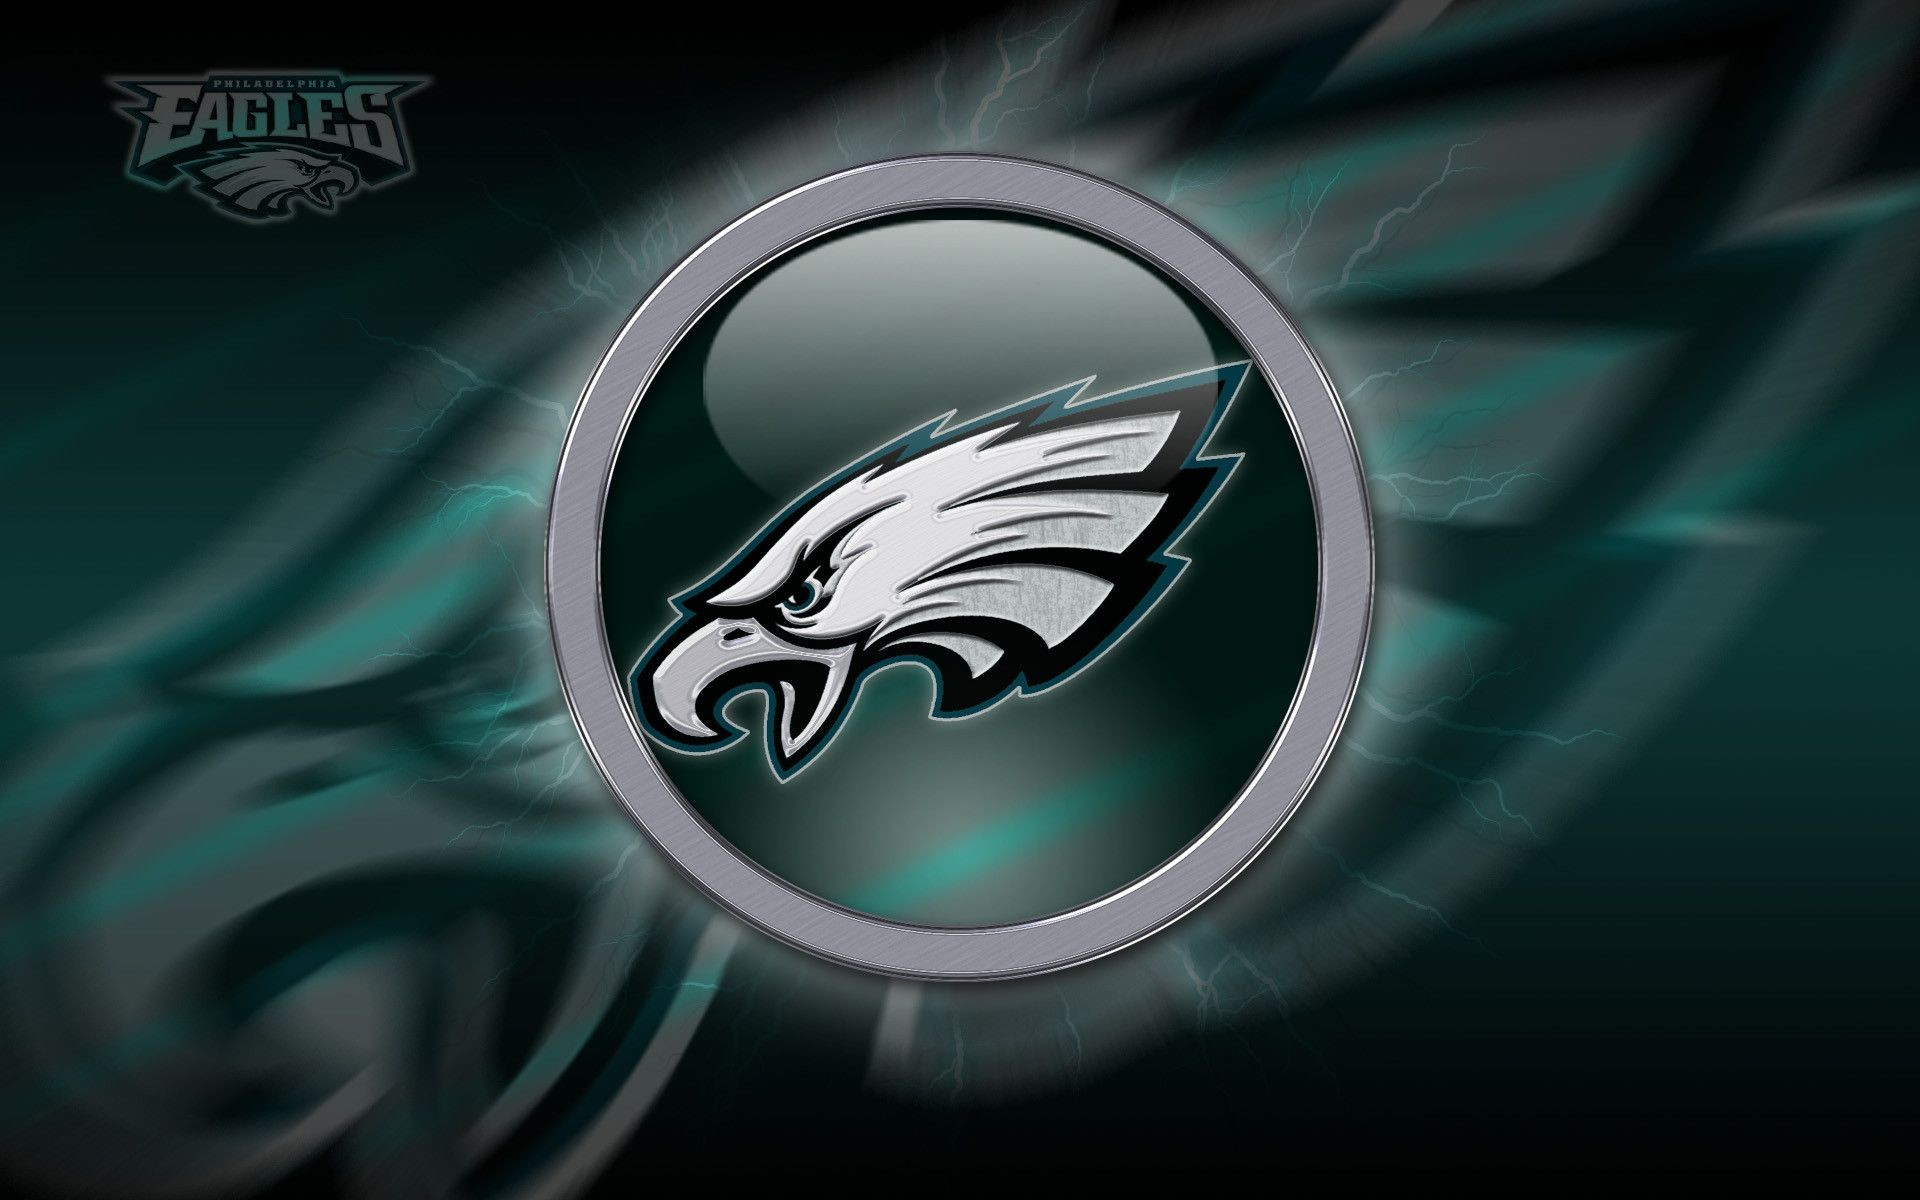 Iphone 5 Hd Wallpapers 1080p: Philadelphia Eagles Wallpaper ·① Download Free Amazing HD